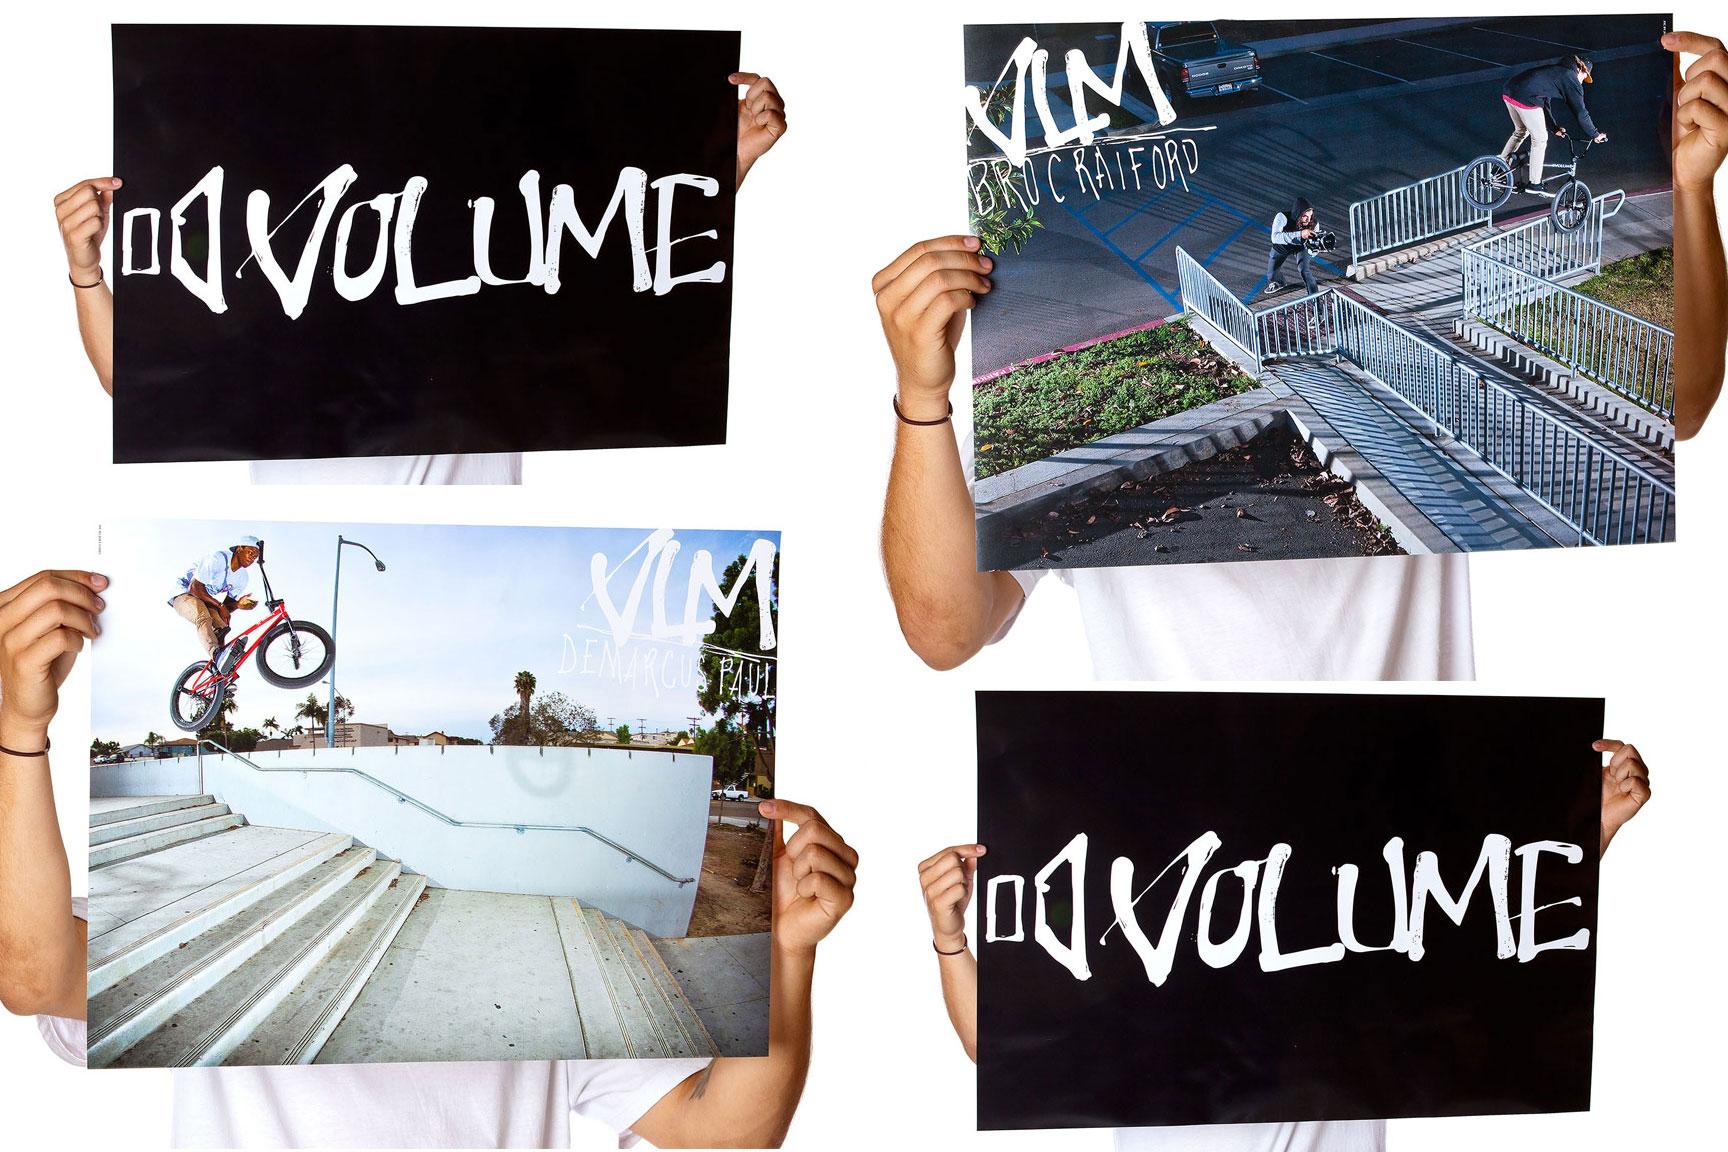 2014 Volume posters